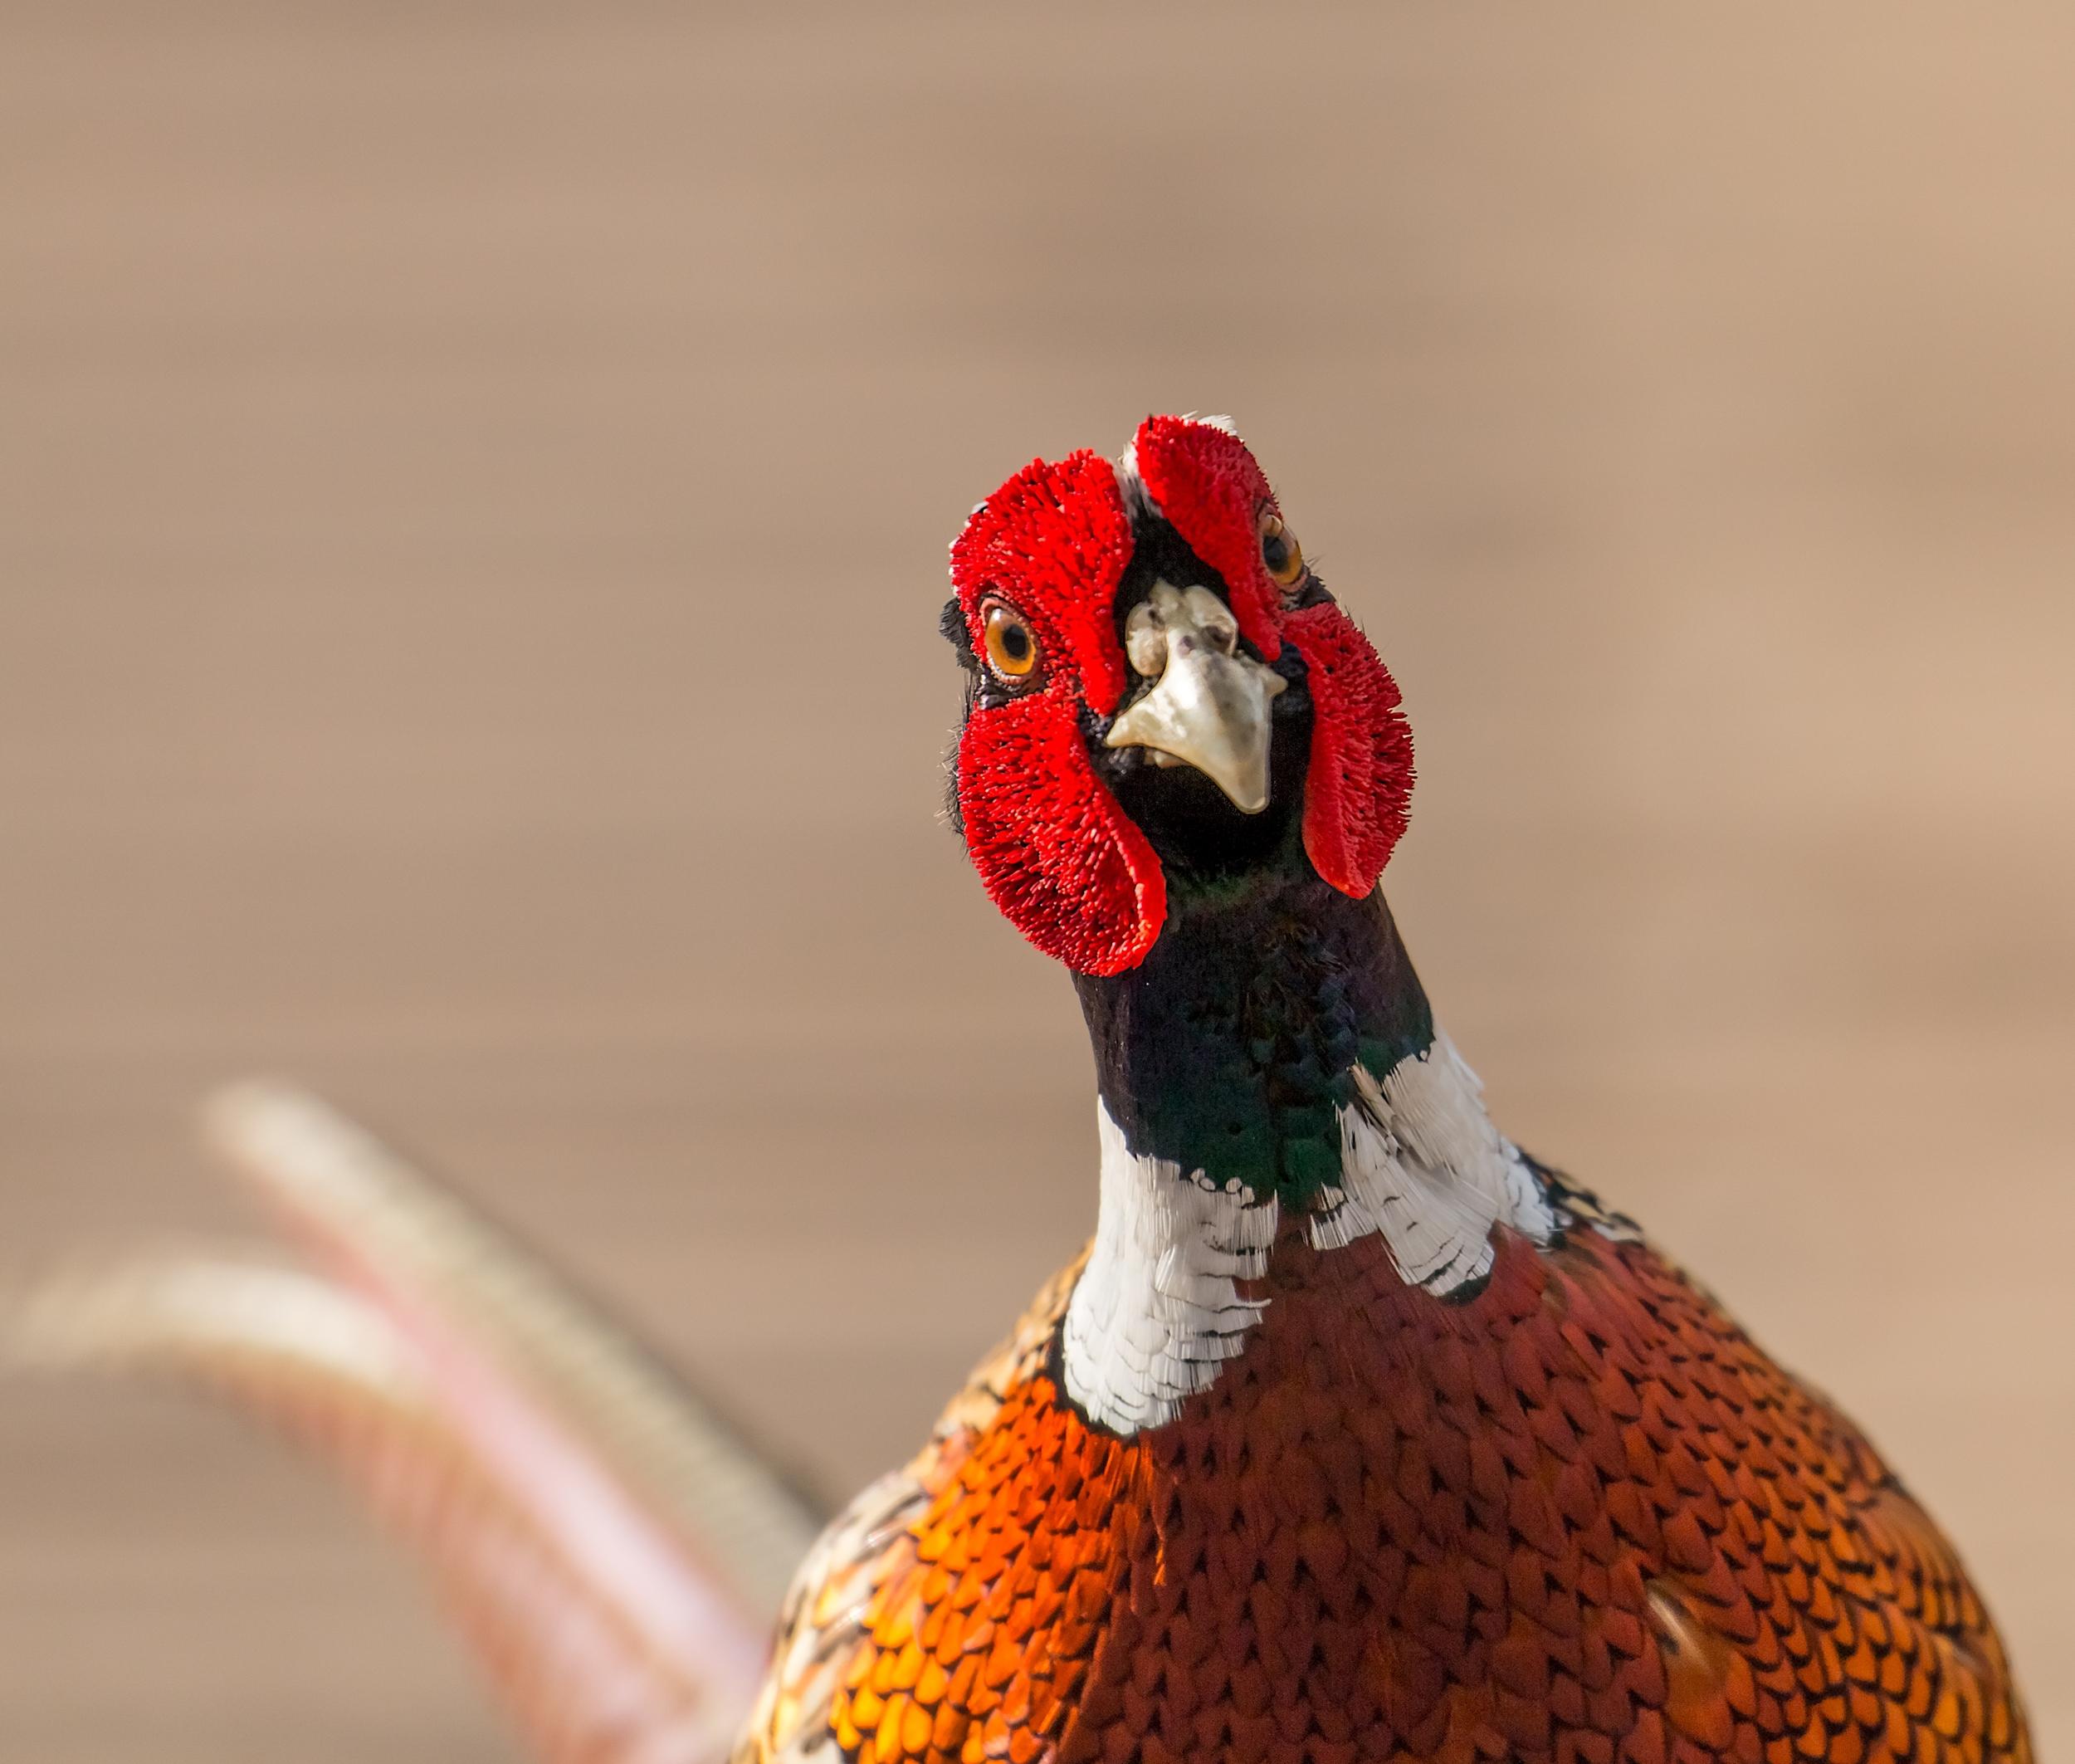 Pheasant attitude